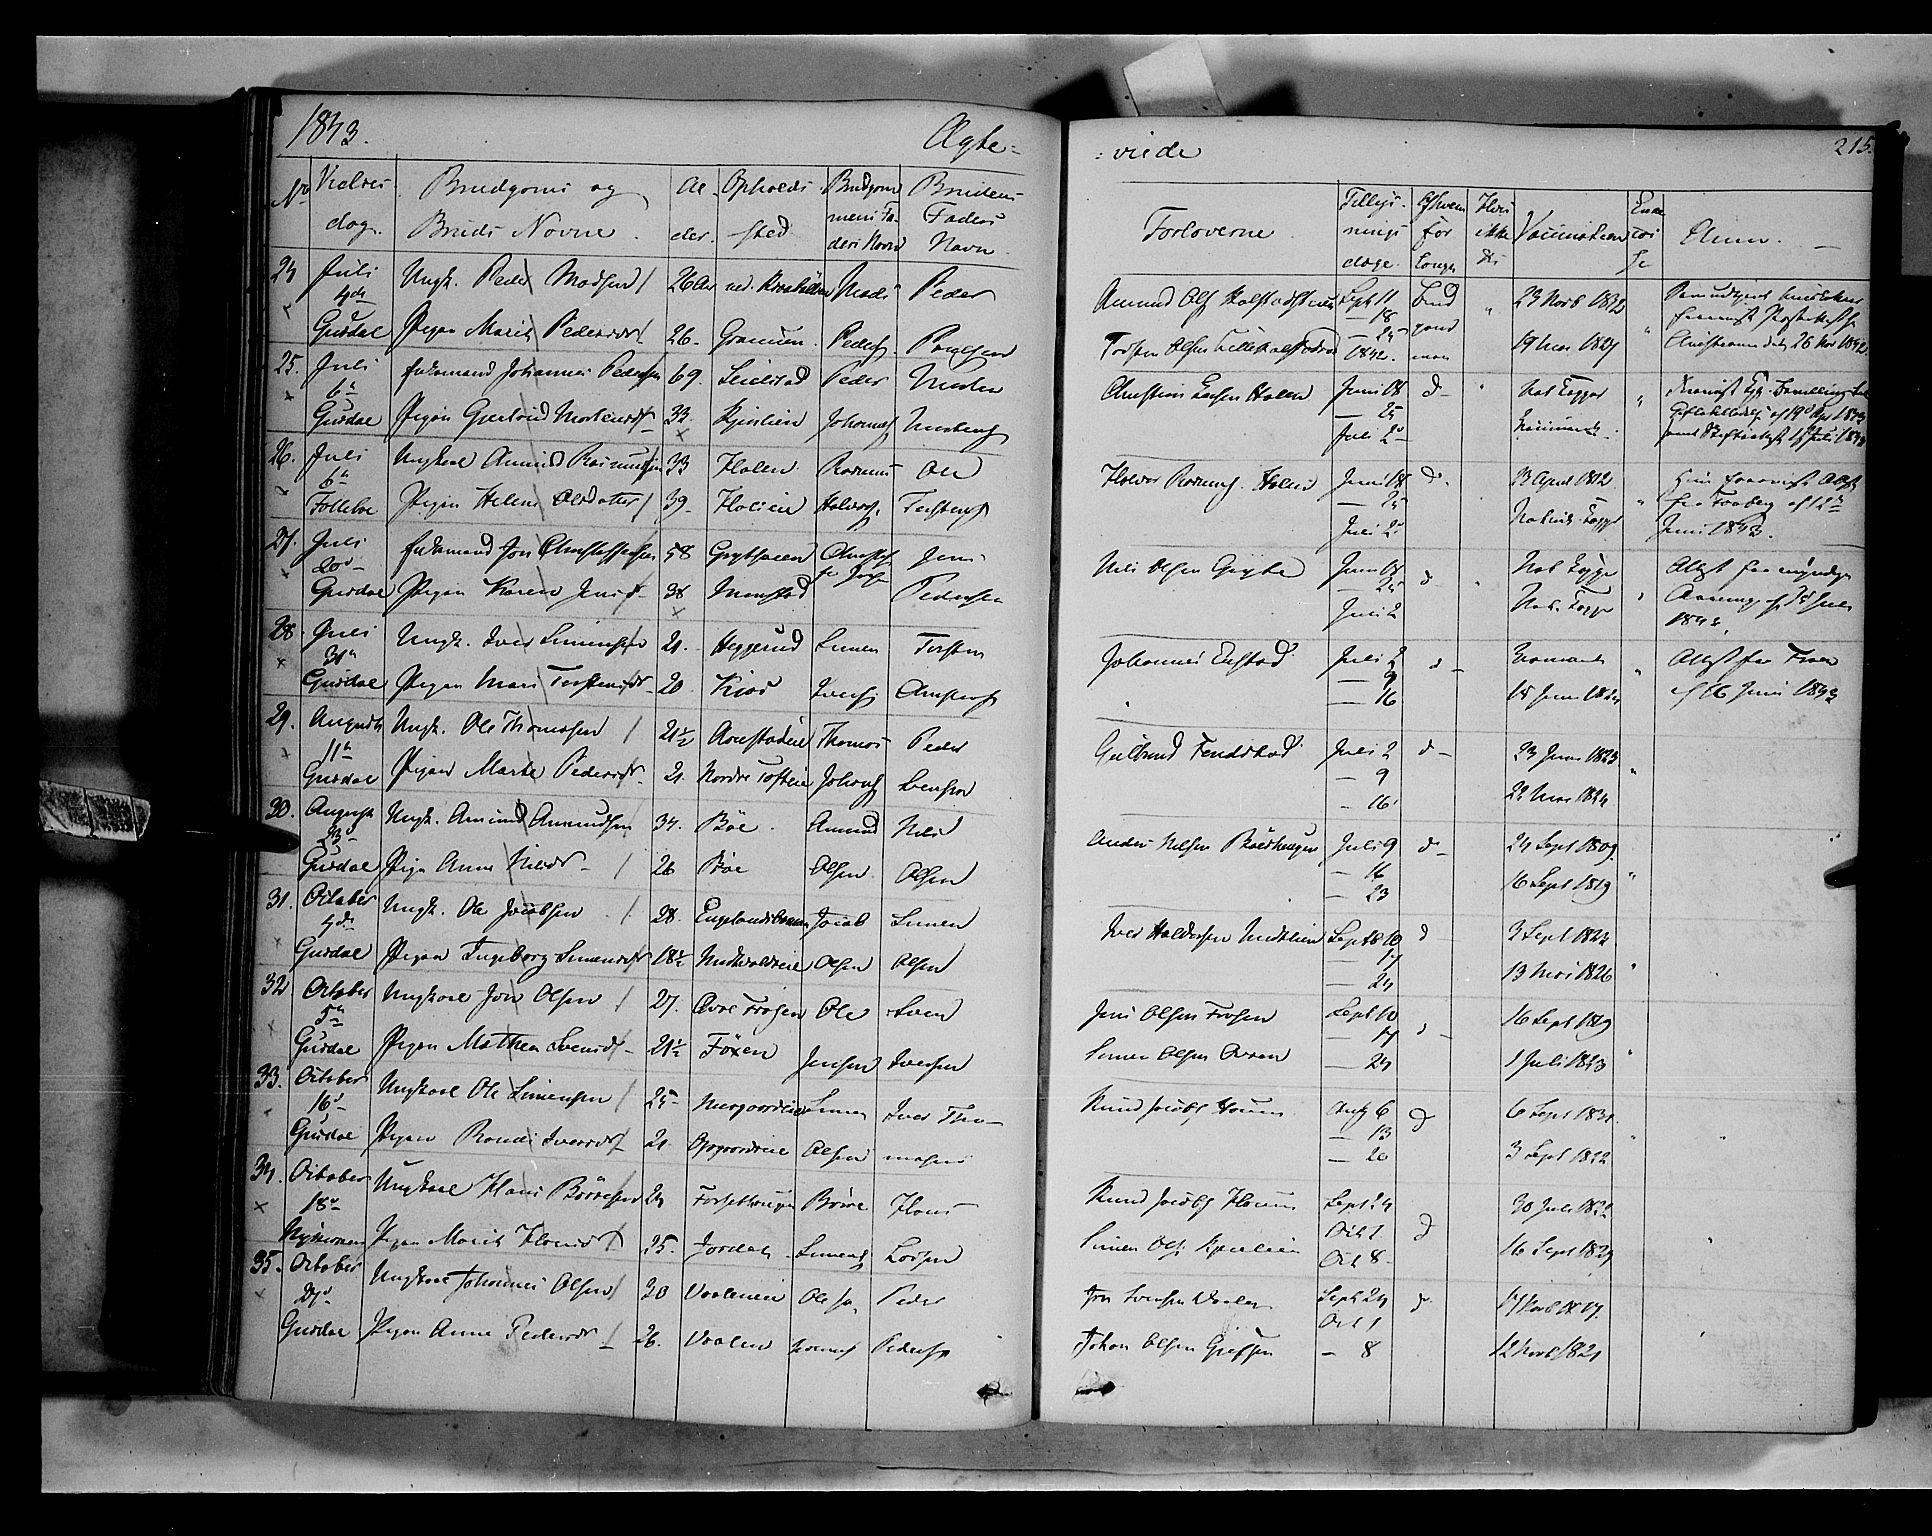 SAH, Gausdal prestekontor, Ministerialbok nr. 7, 1840-1850, s. 215